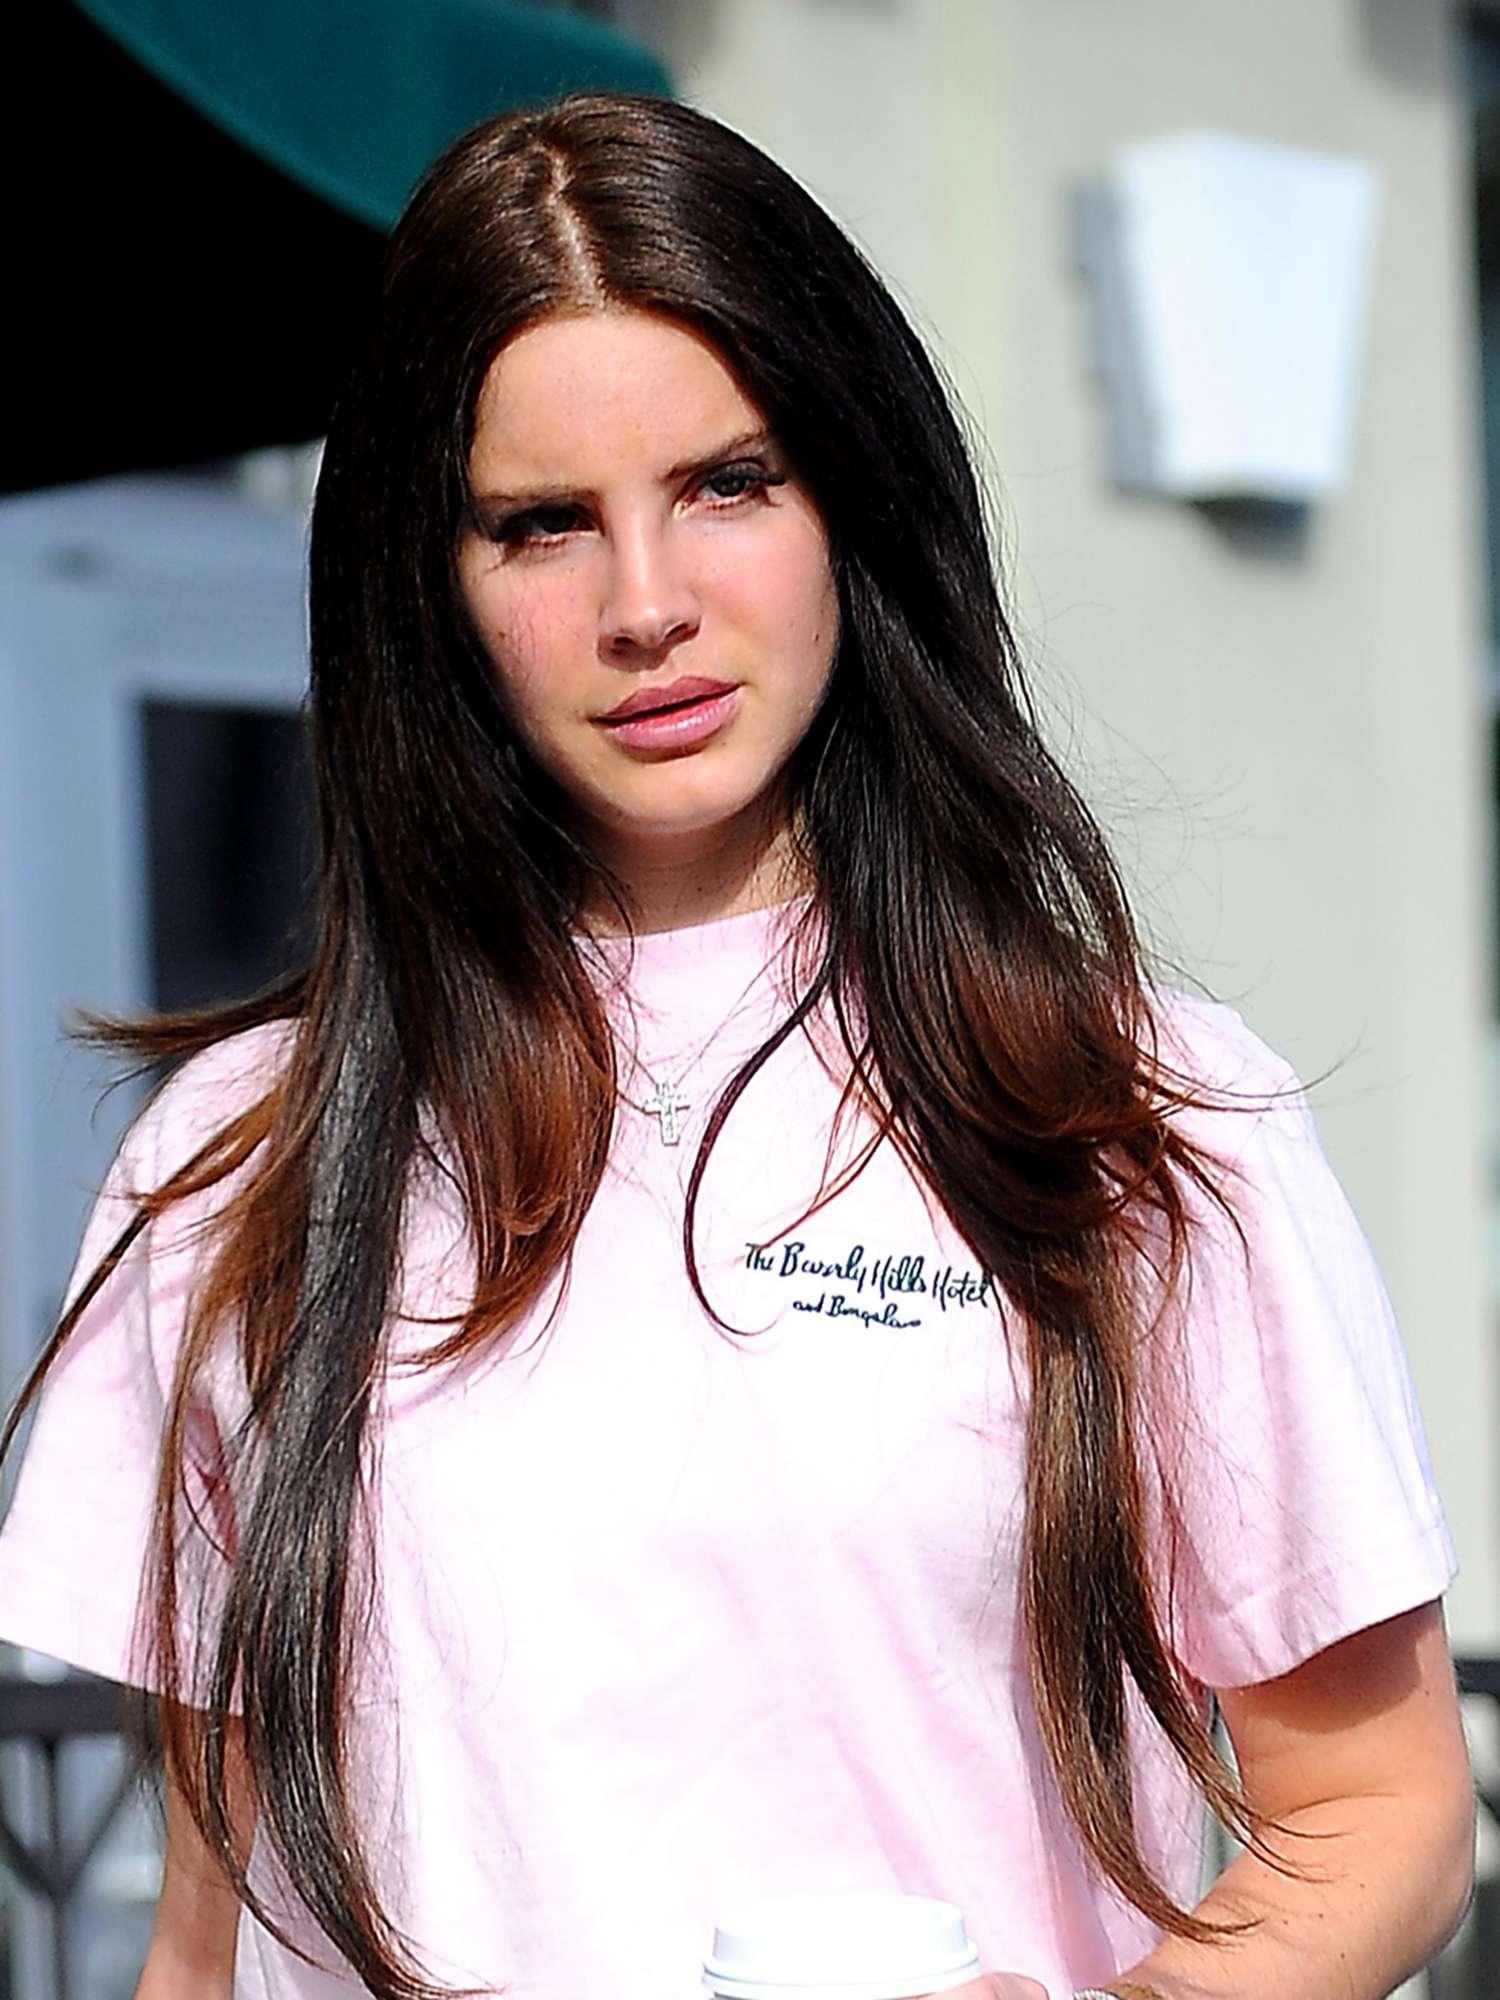 Lana Del Rey In Ripped Jeans 10 Gotceleb